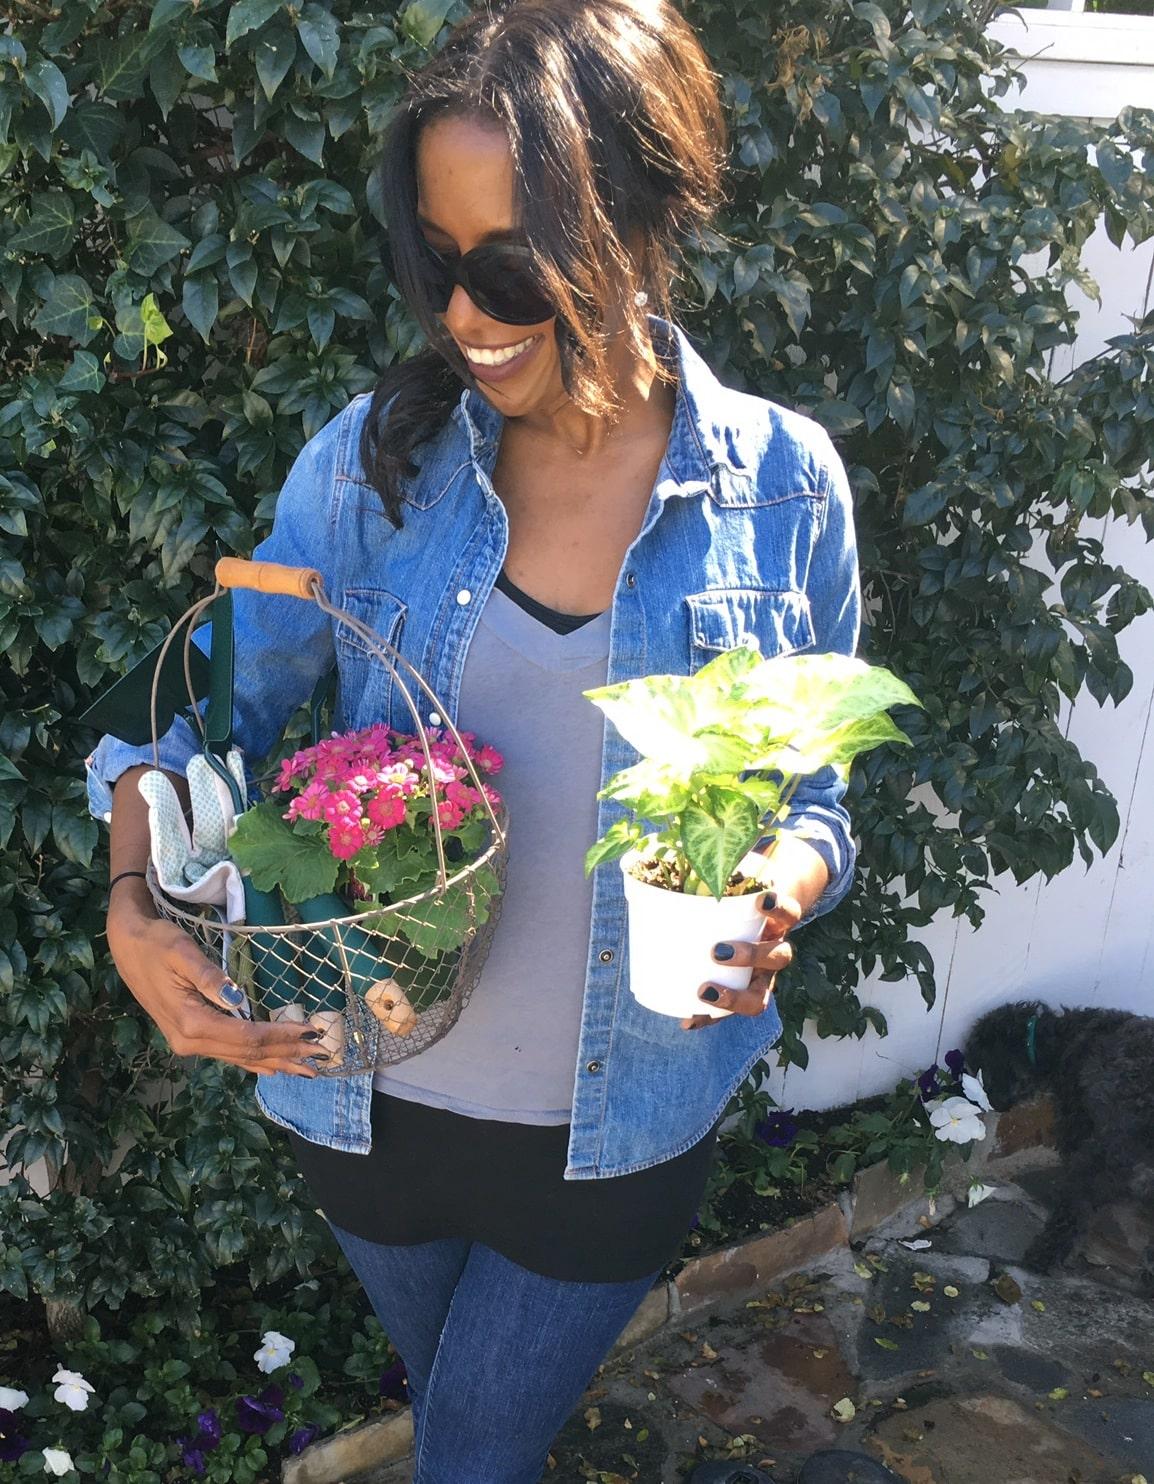 Coco-Gardening-flower-box-planter-cococozy